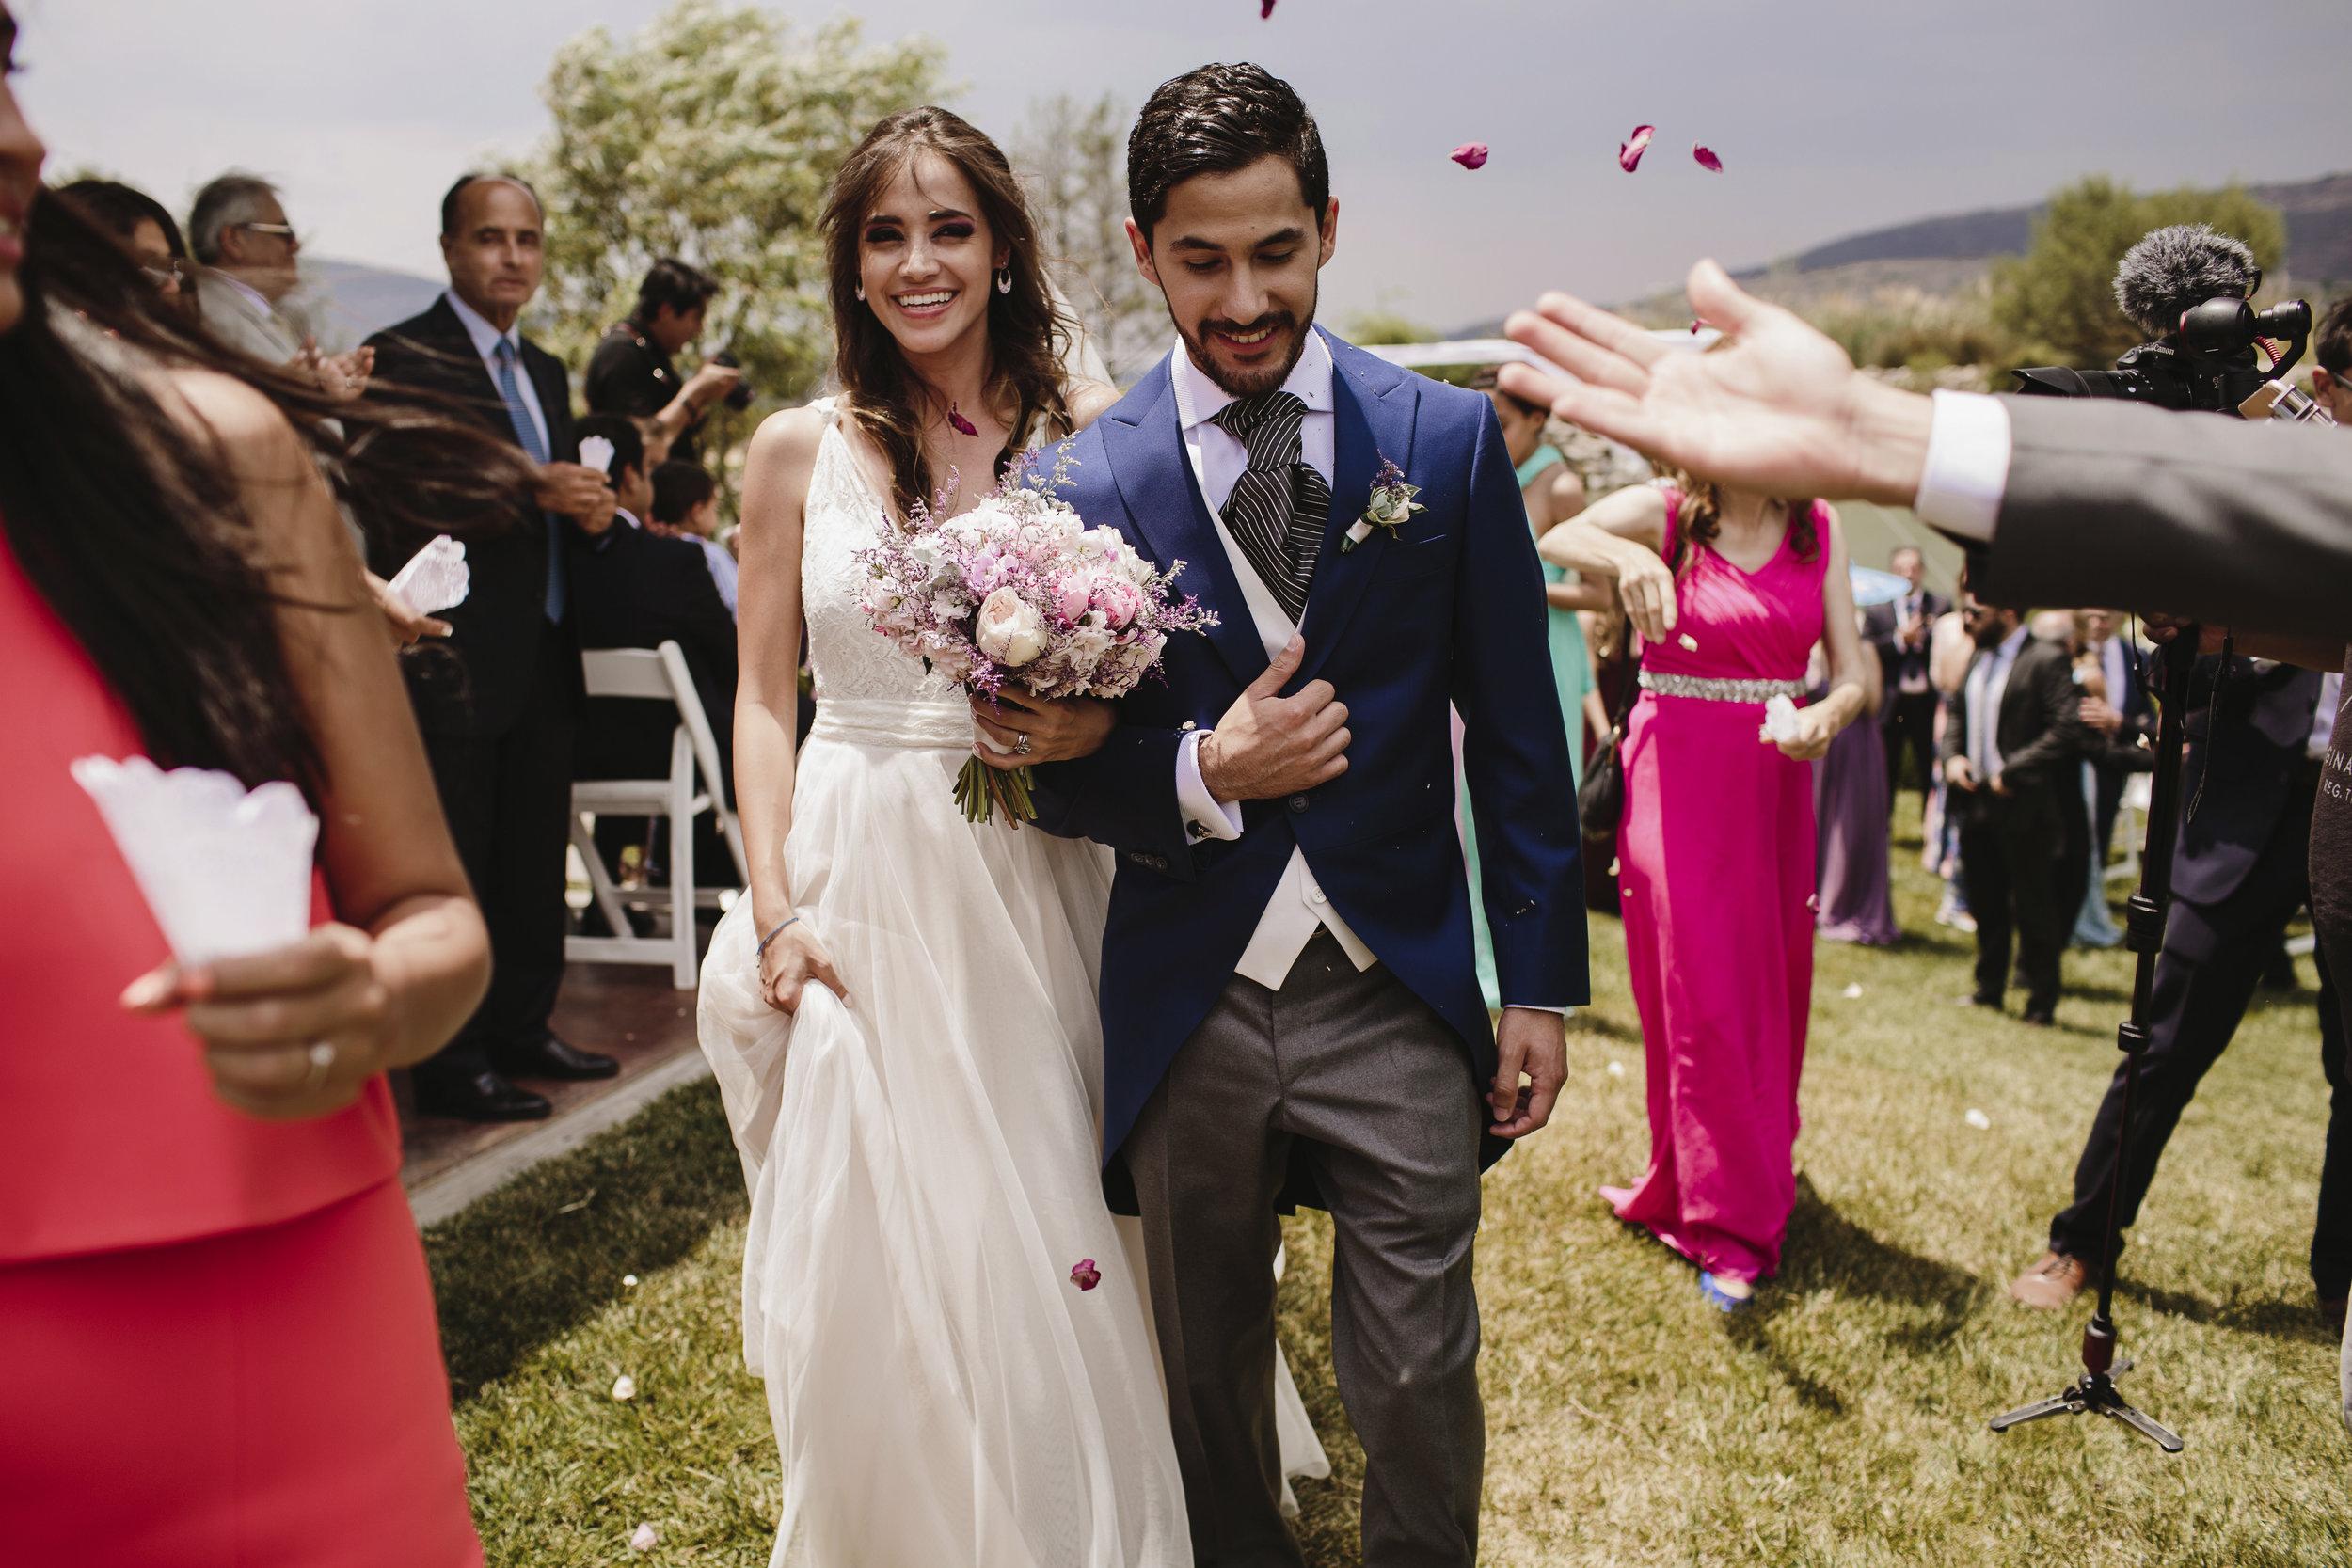 alfons_flores_destination_wedding_photography_mavi_david-1150.JPG